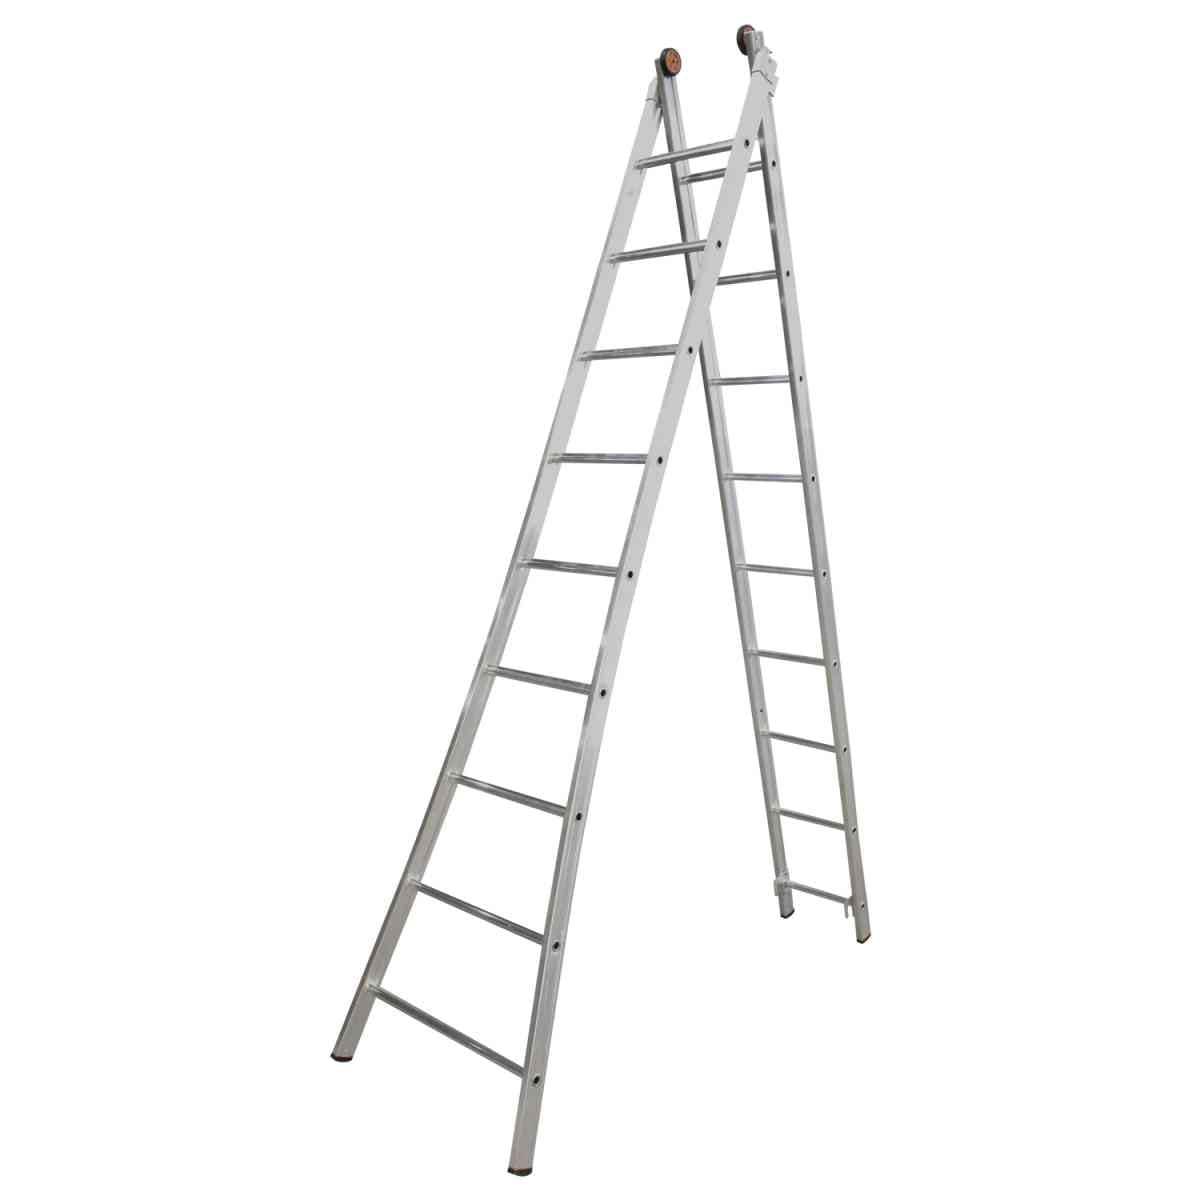 Escada Alumínio Extensível 9 Degraus Alulev ED109